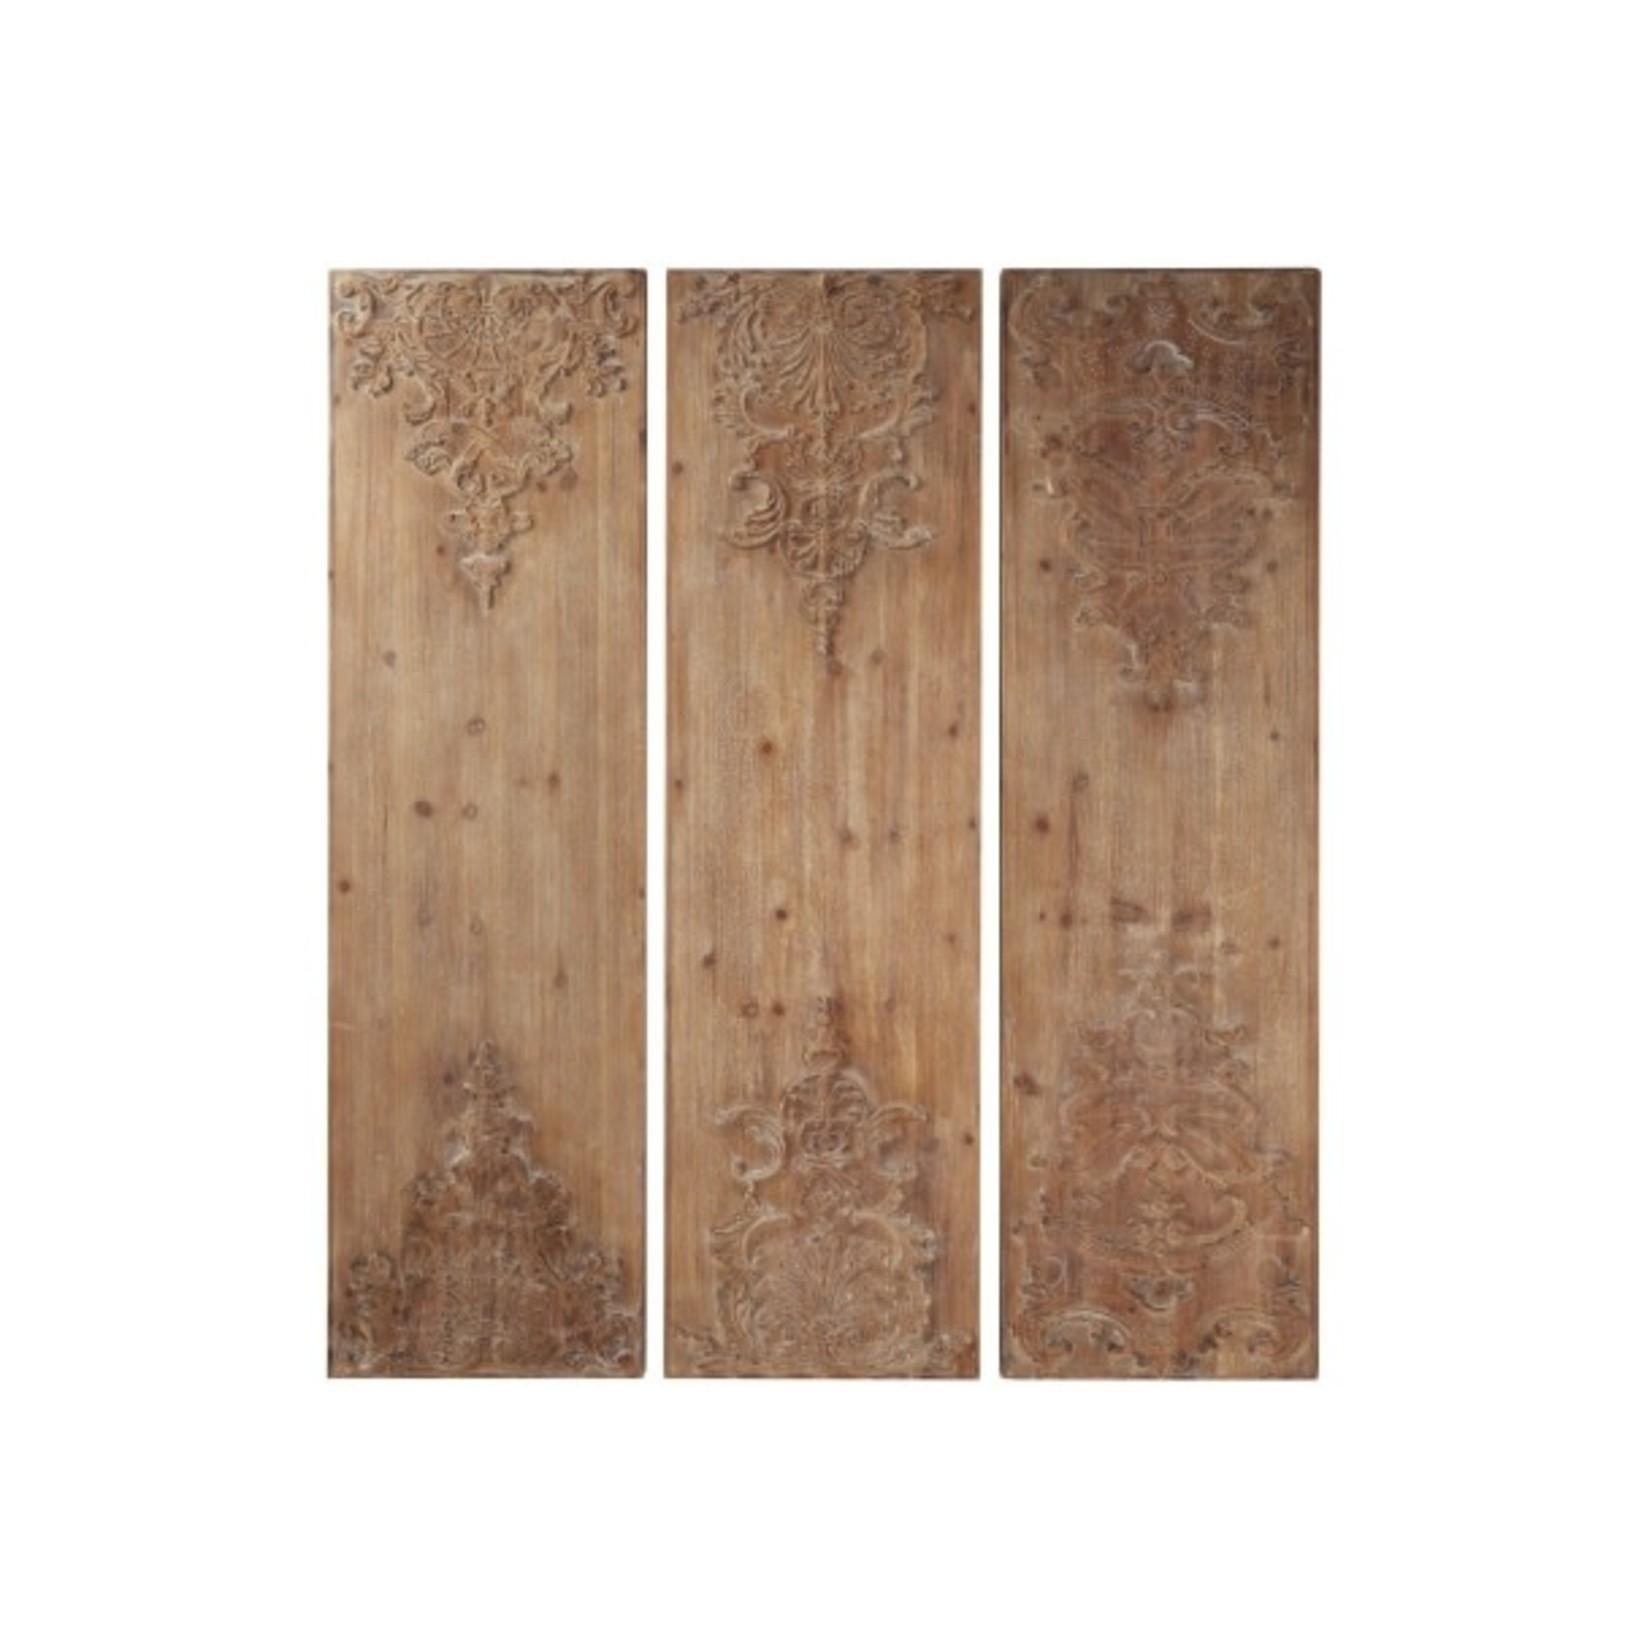 Panel Wood Wall Decor With Embellishment 81483